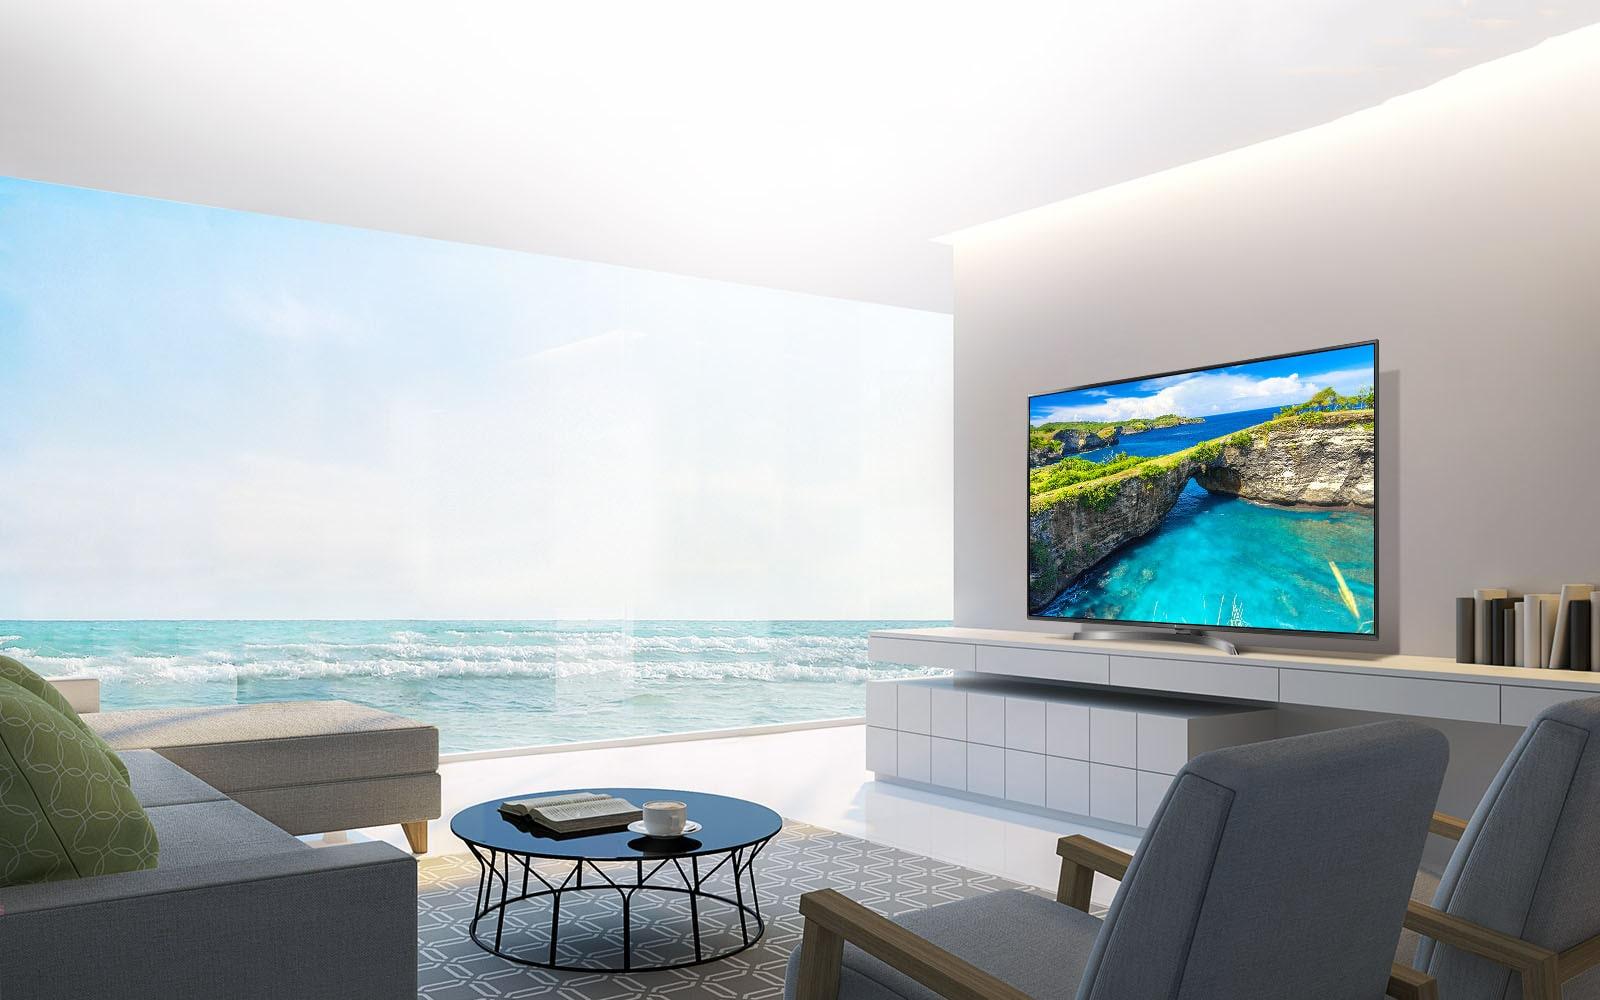 lg tv led 43 pouces 108 cm uhd 4k d couvrez la lg 43uk6750. Black Bedroom Furniture Sets. Home Design Ideas